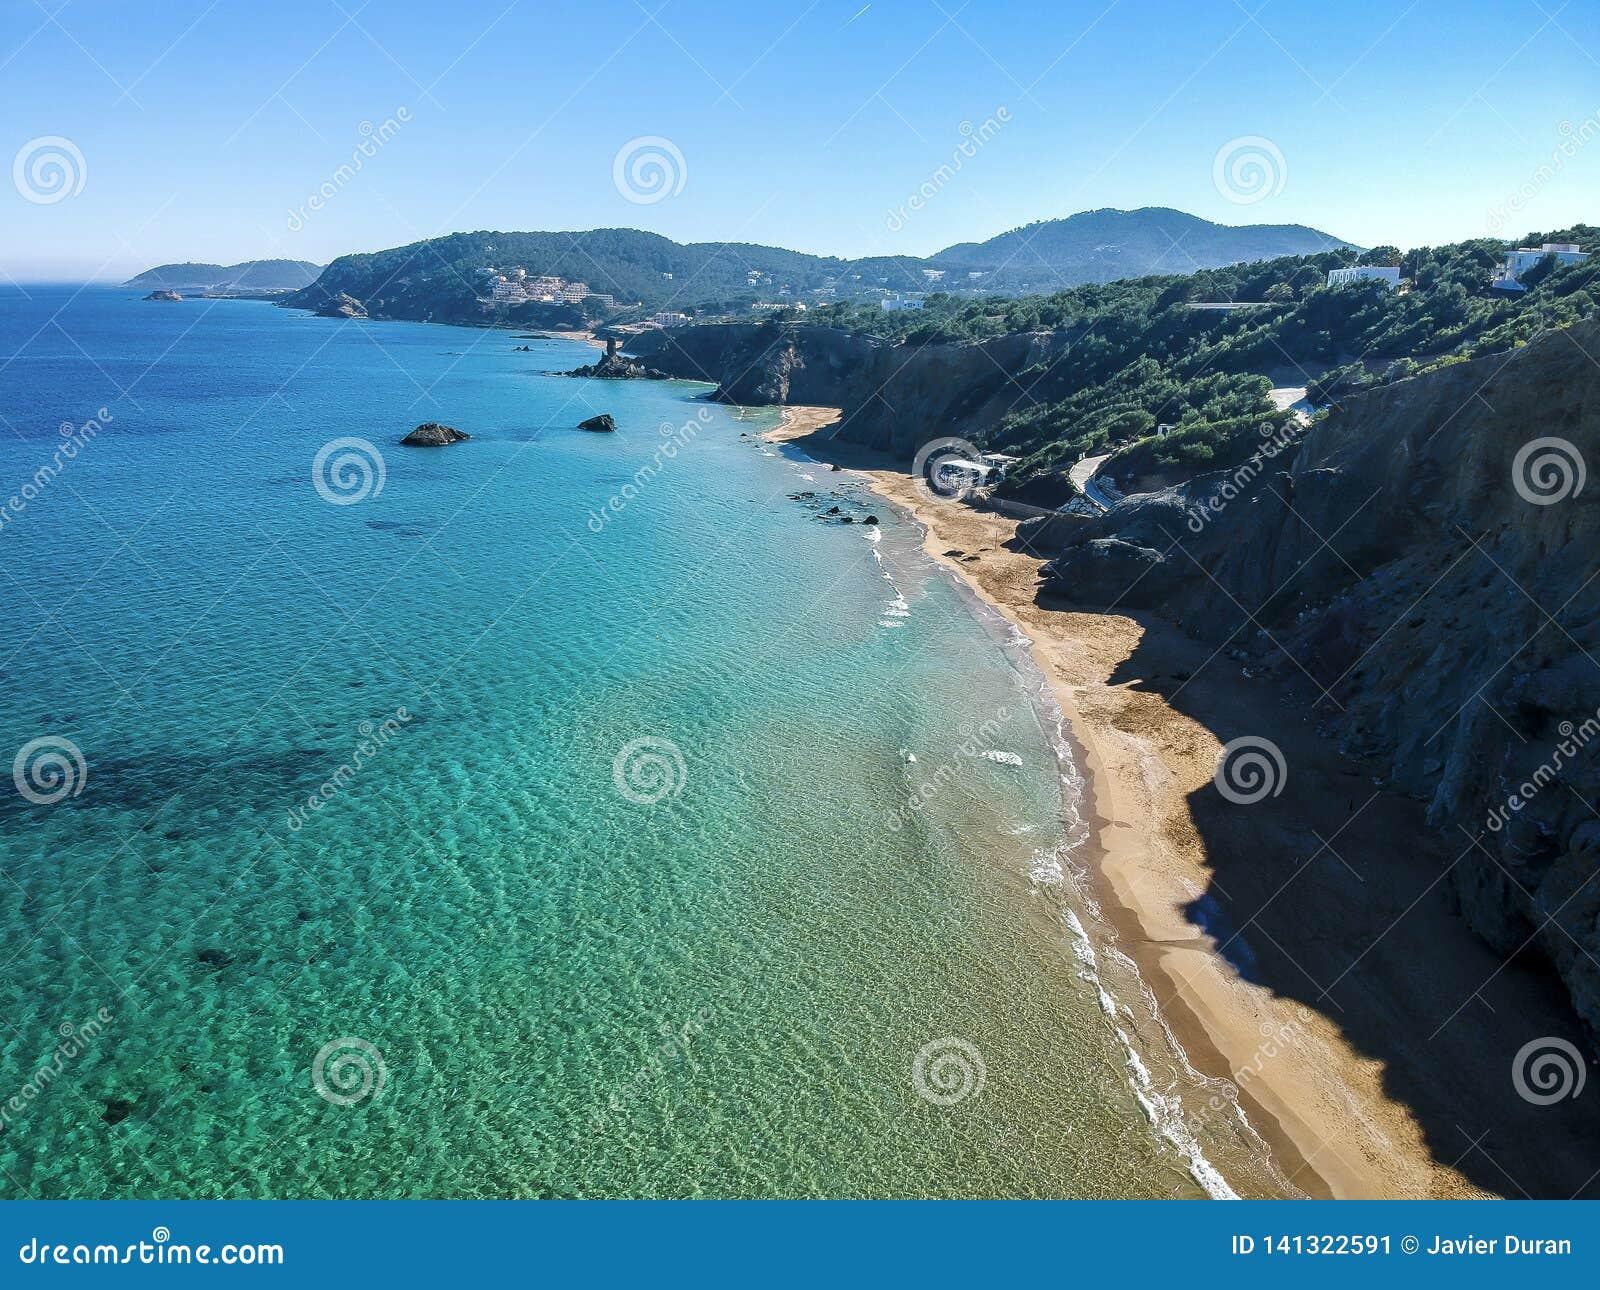 Praia de Blancas das águas situada na costa leste da ilha de Ibiza, Espanha